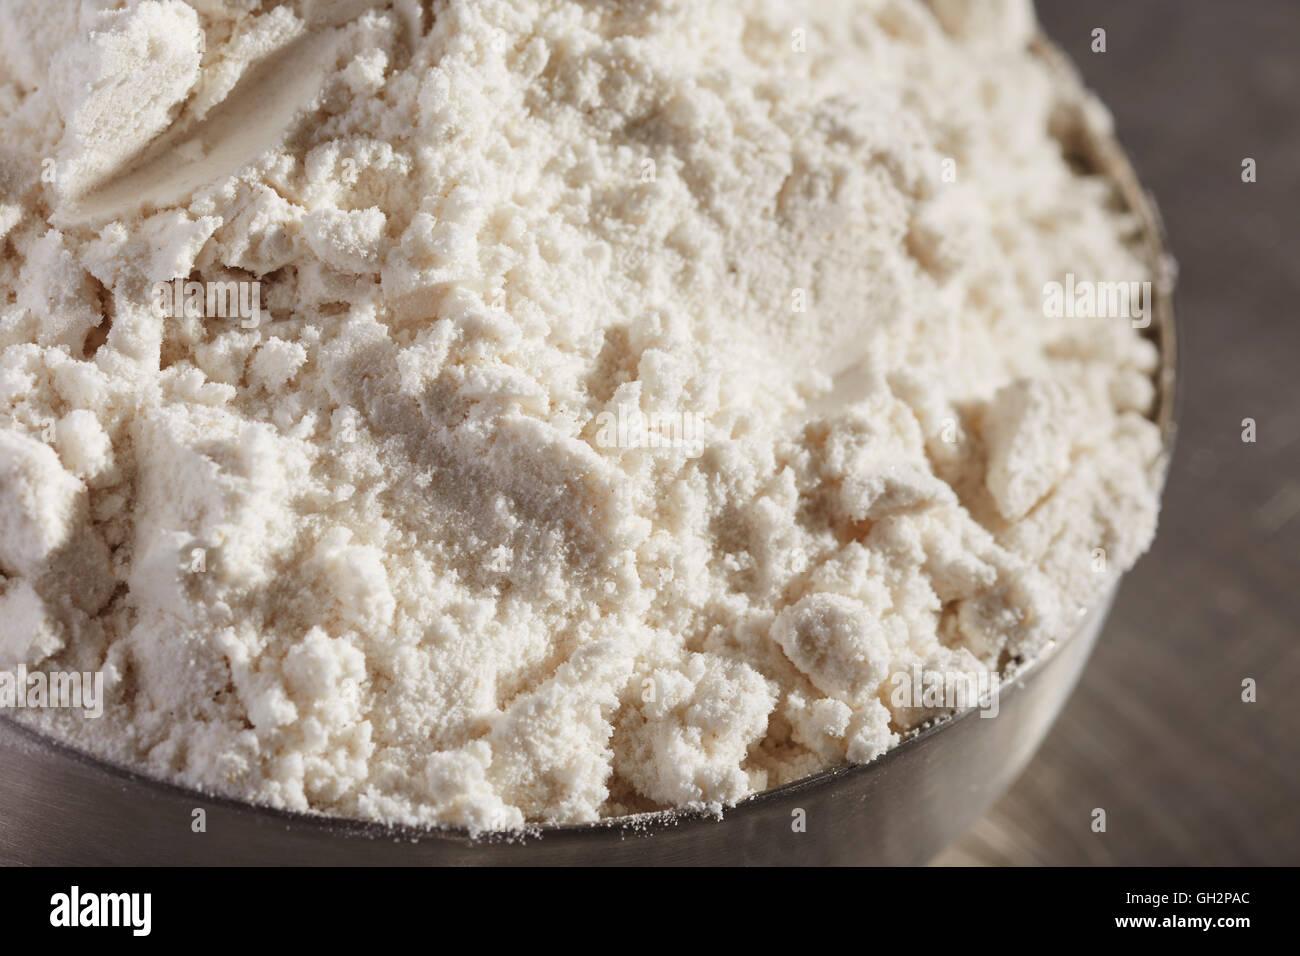 gluten-free flour substitute - Stock Image